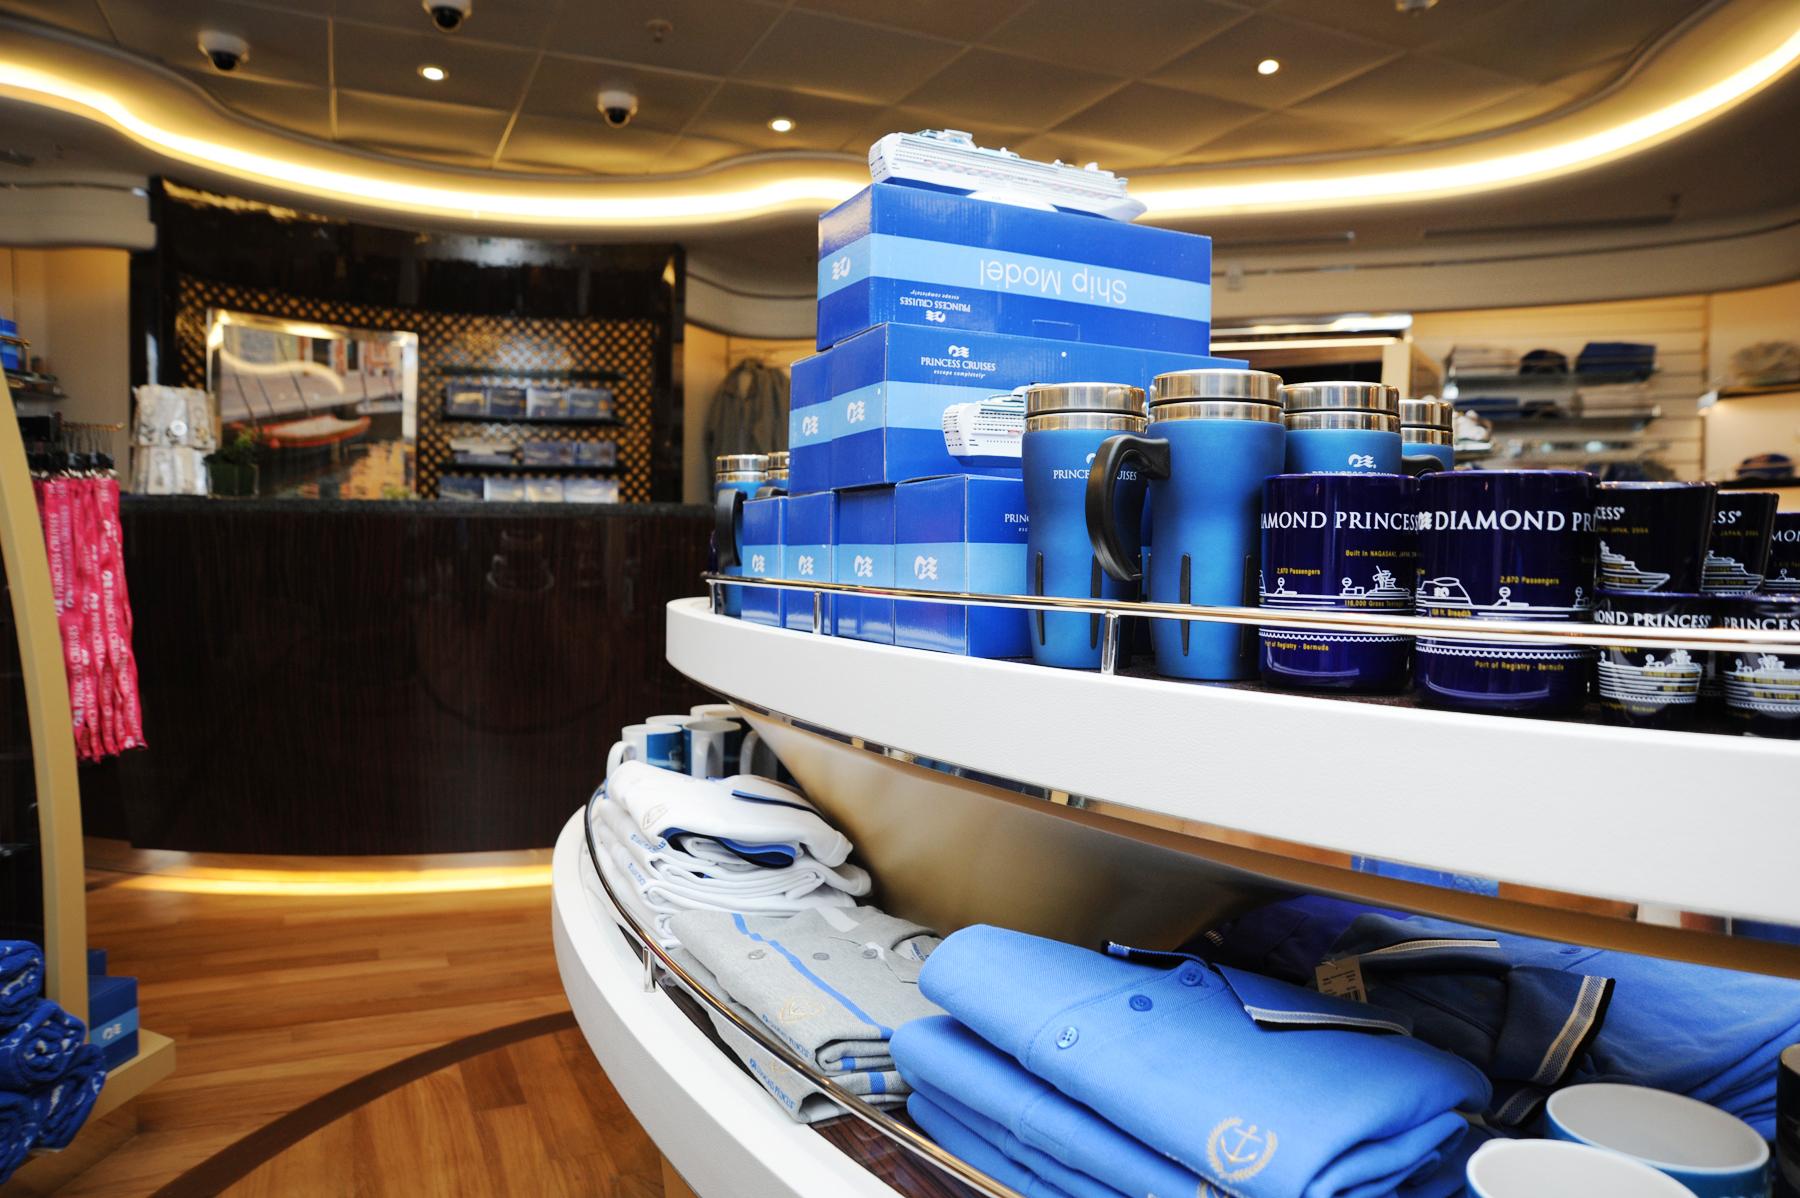 Princess Cruises Coral Class Interior shop 2.jpg